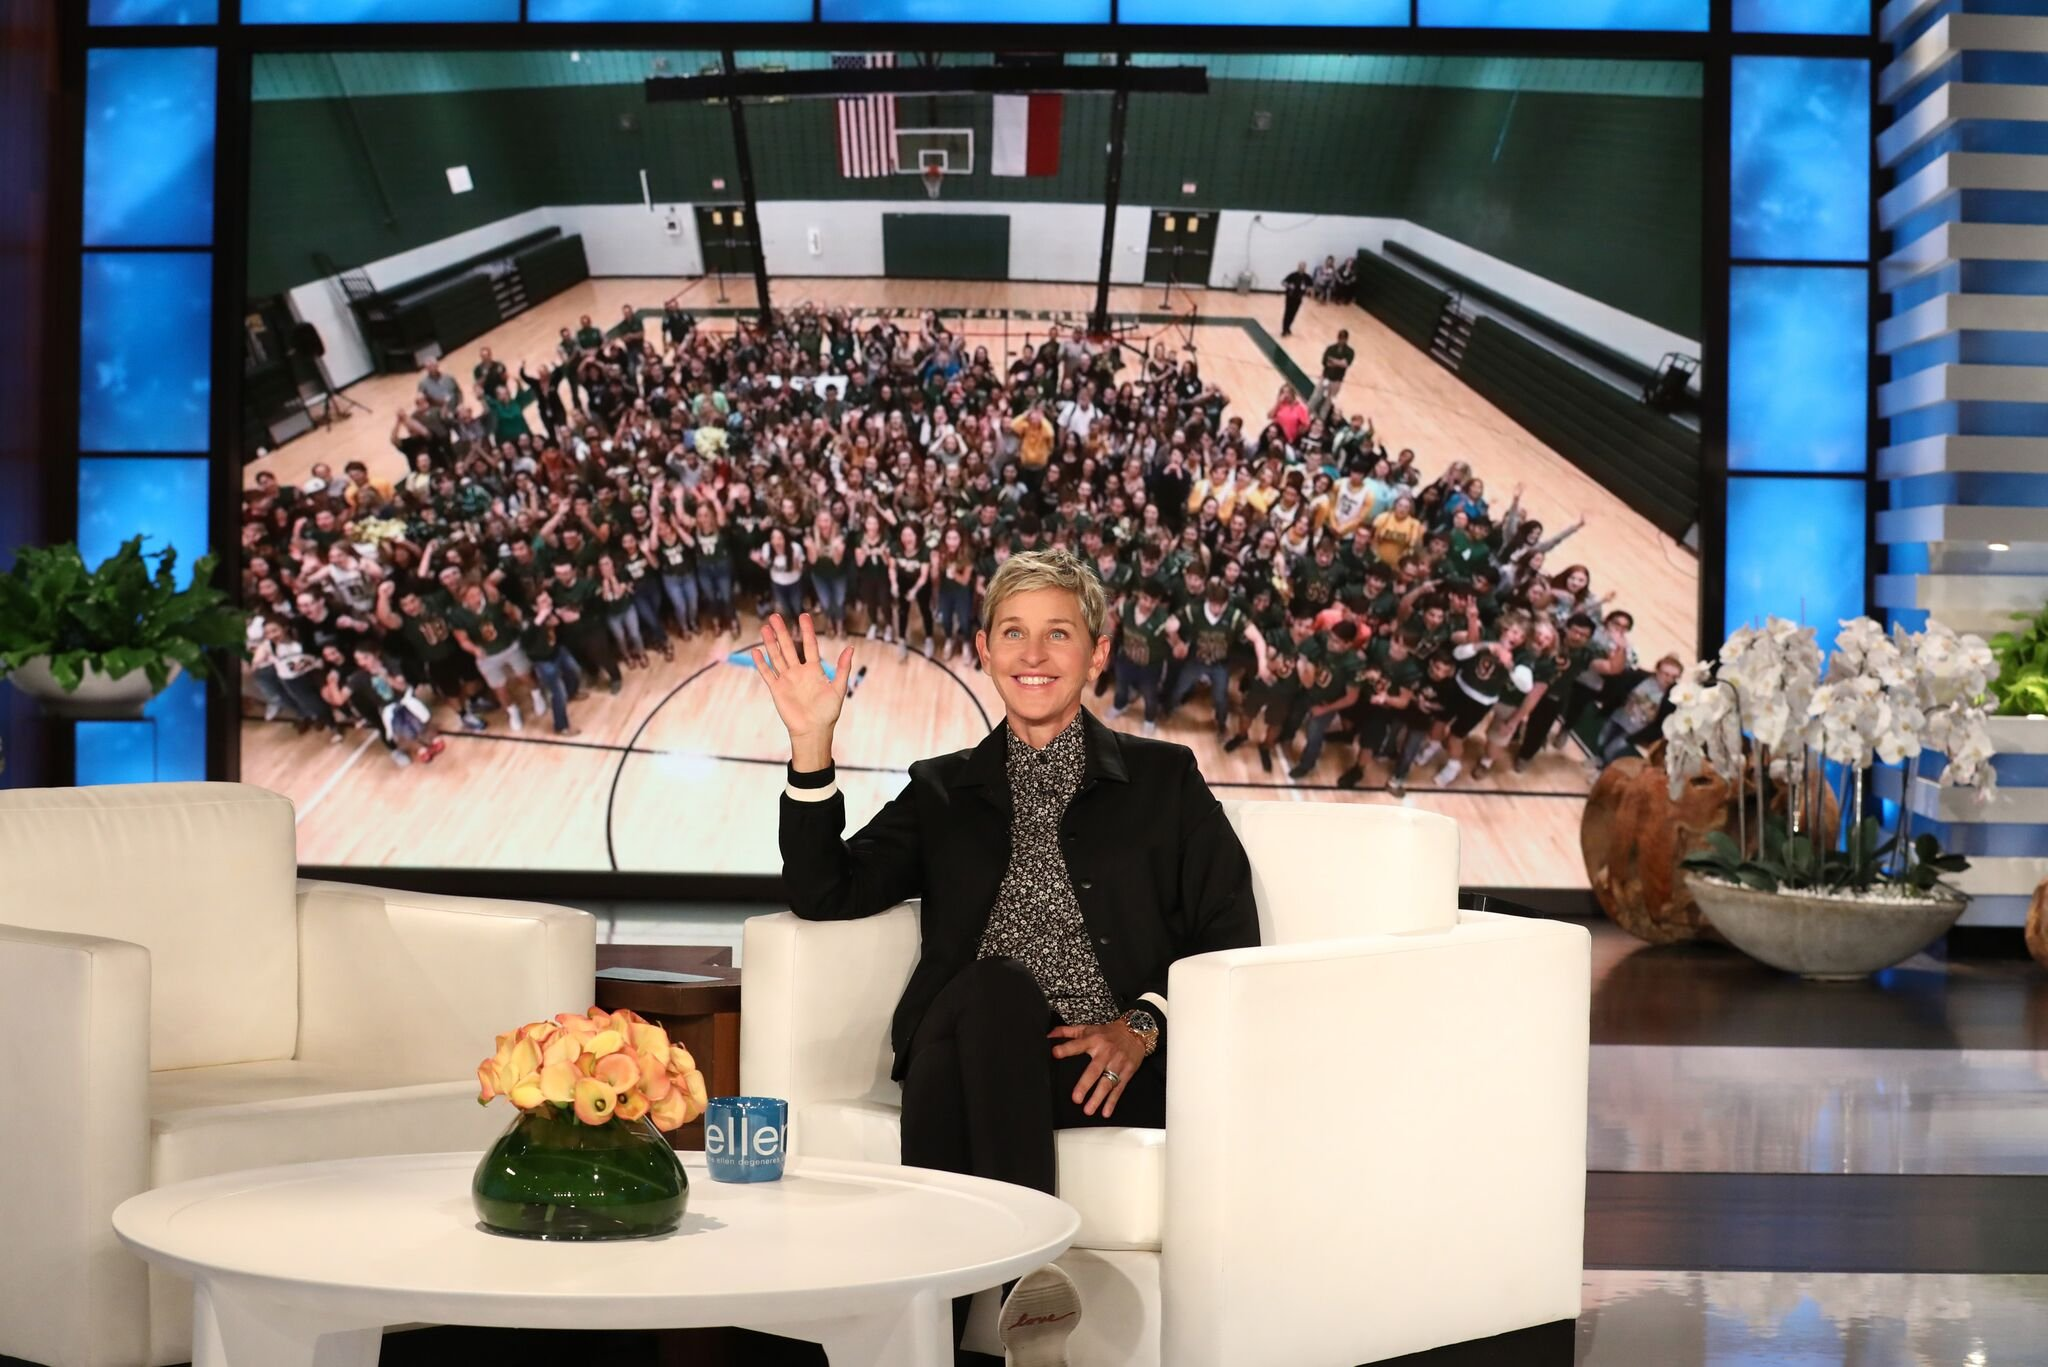 Photo courtesy of The Ellen Show.